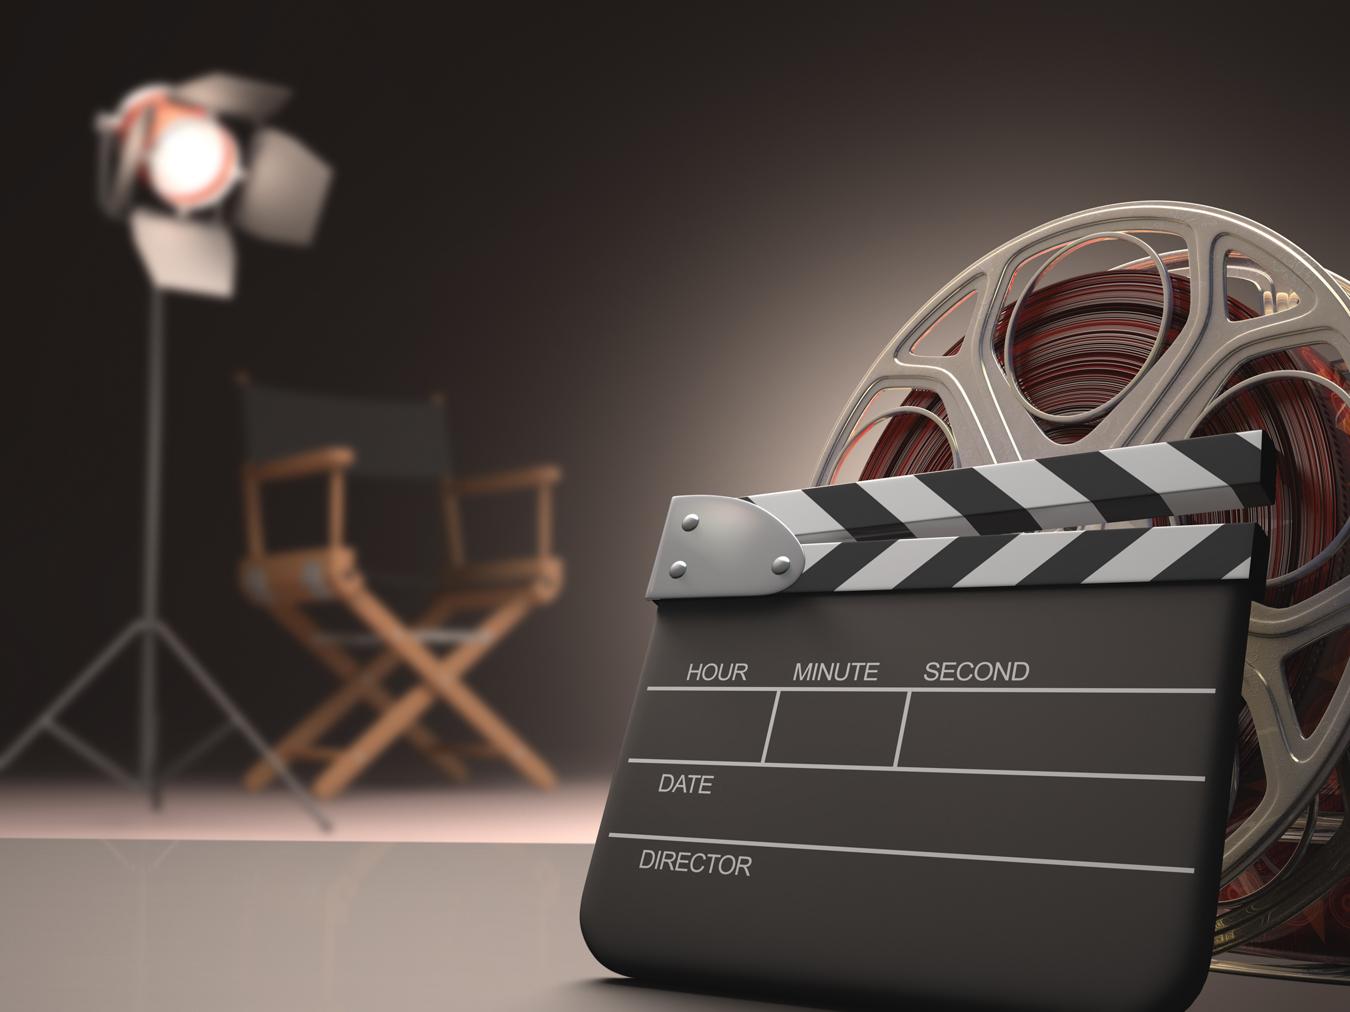 Clapboard Cinema Entertainment Ismail Sirdah